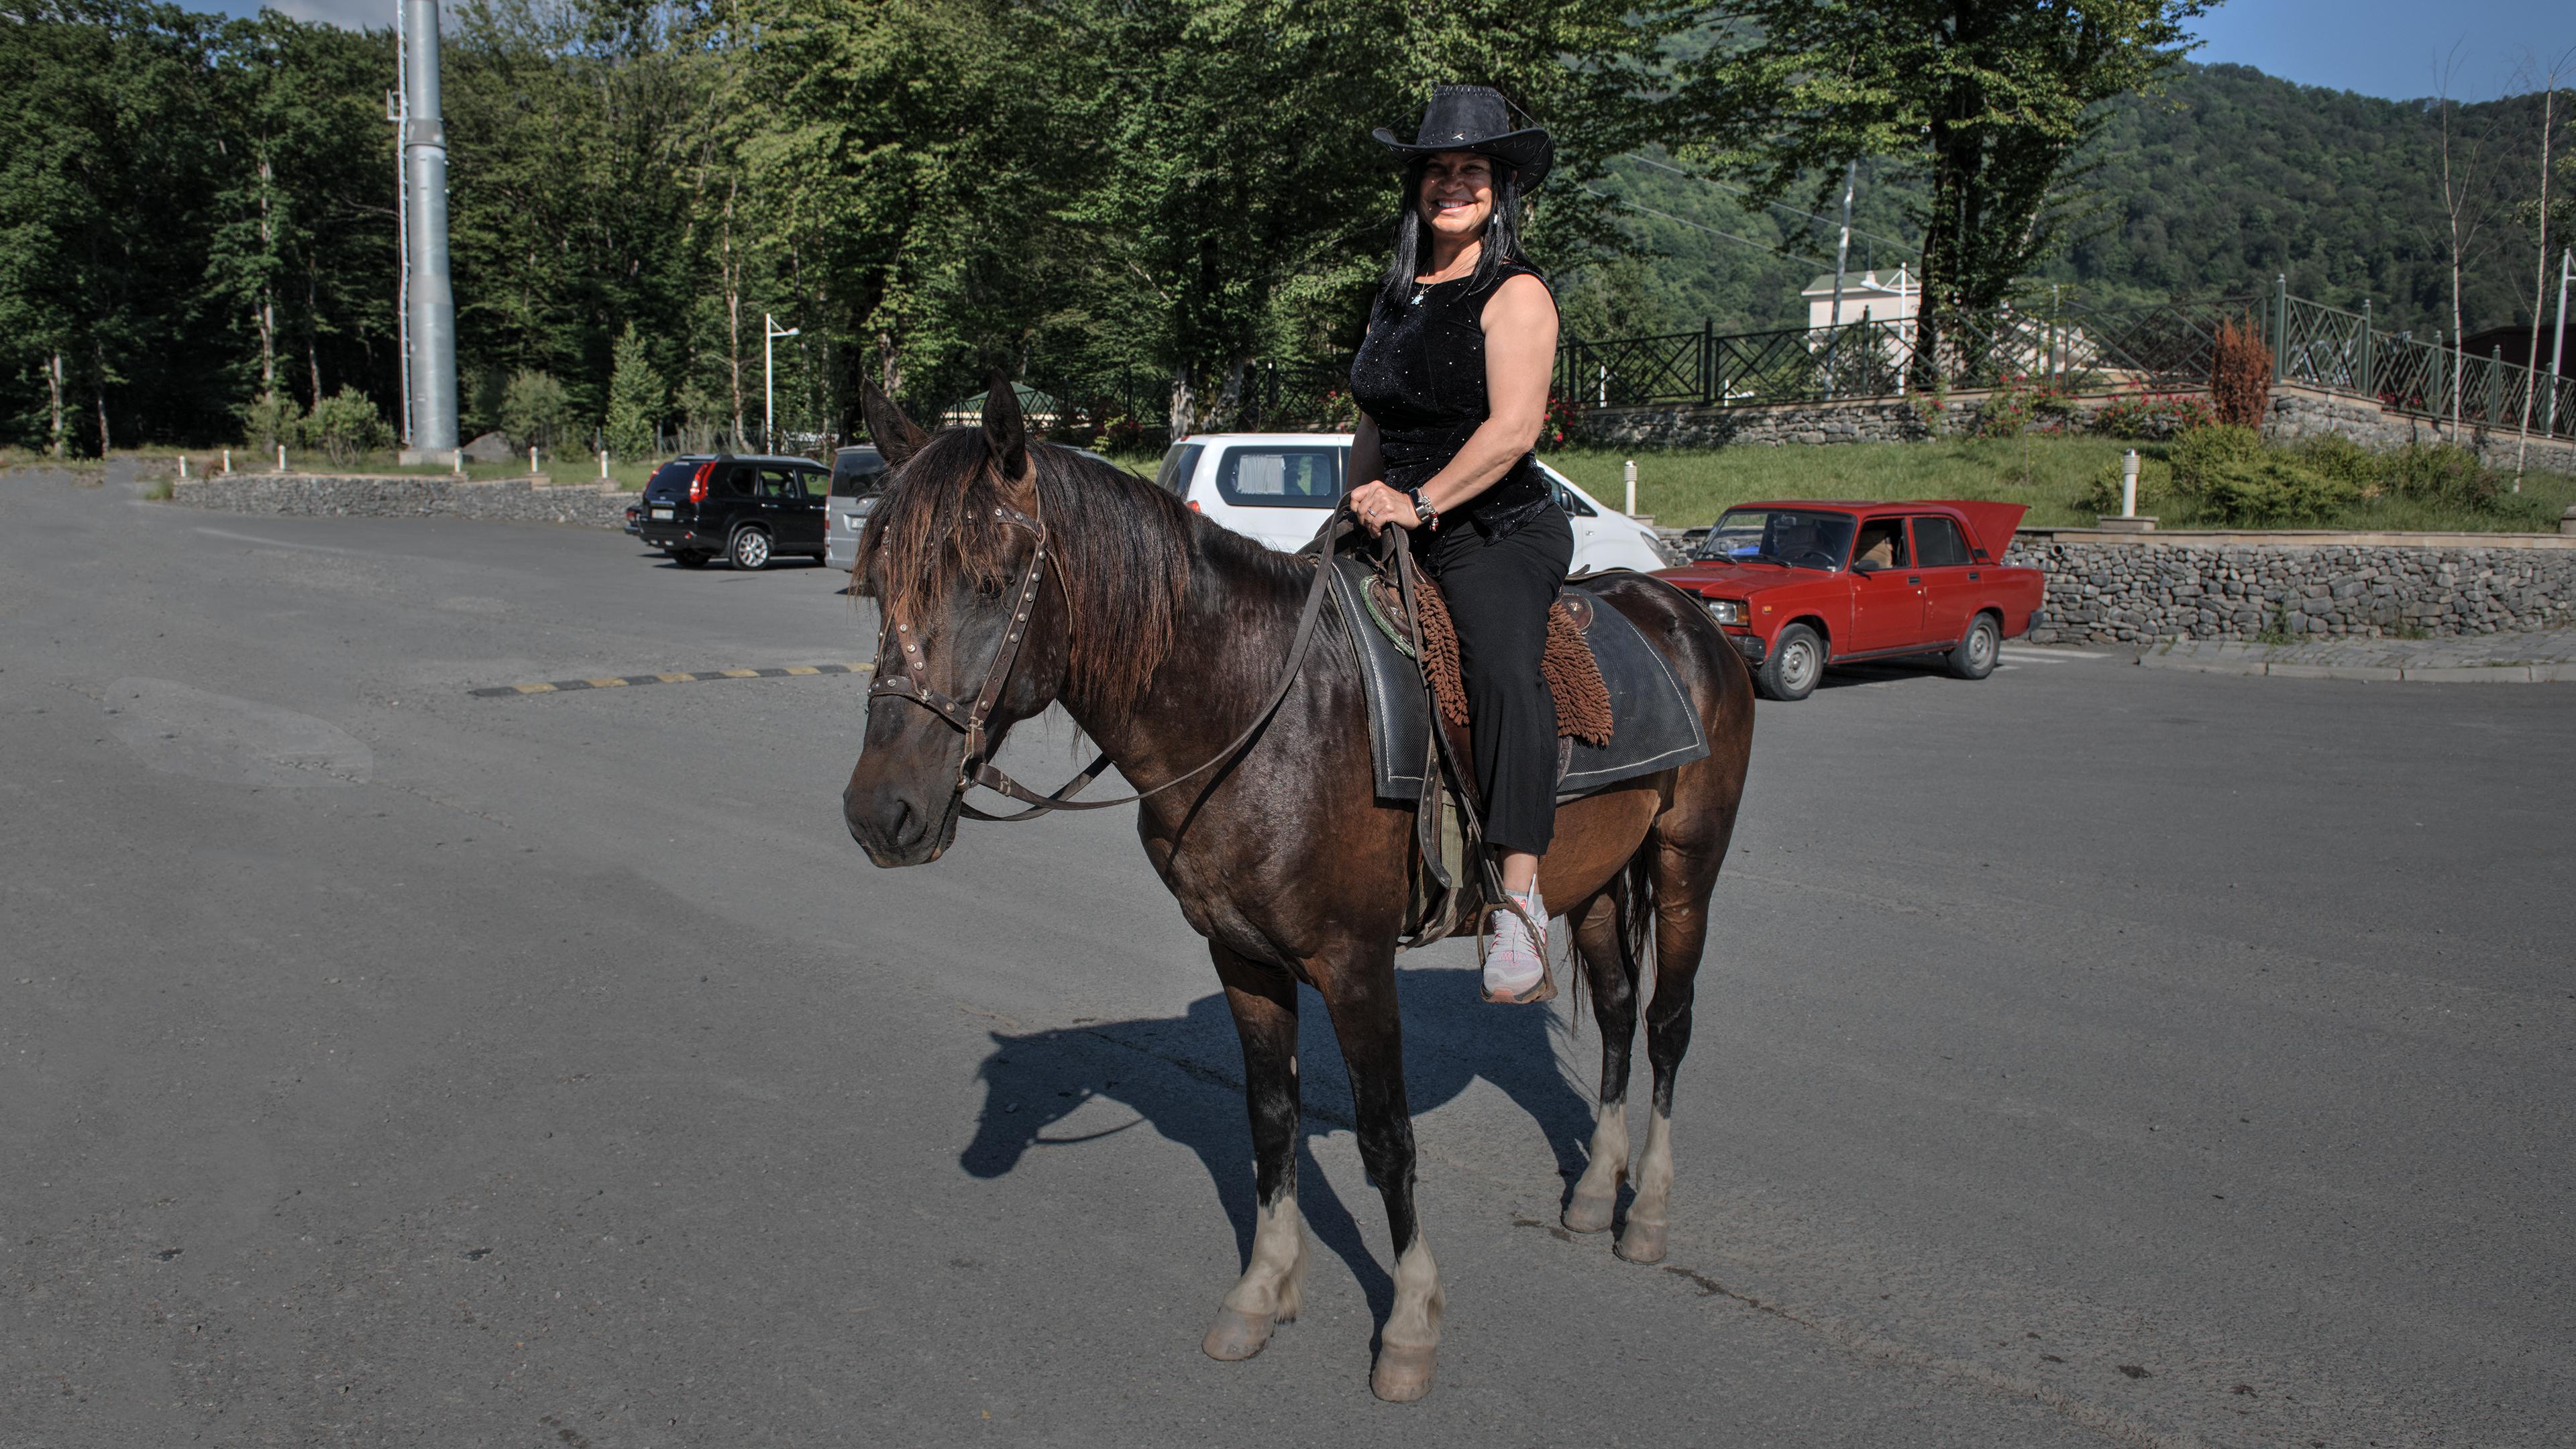 Horse Riding in Qabala